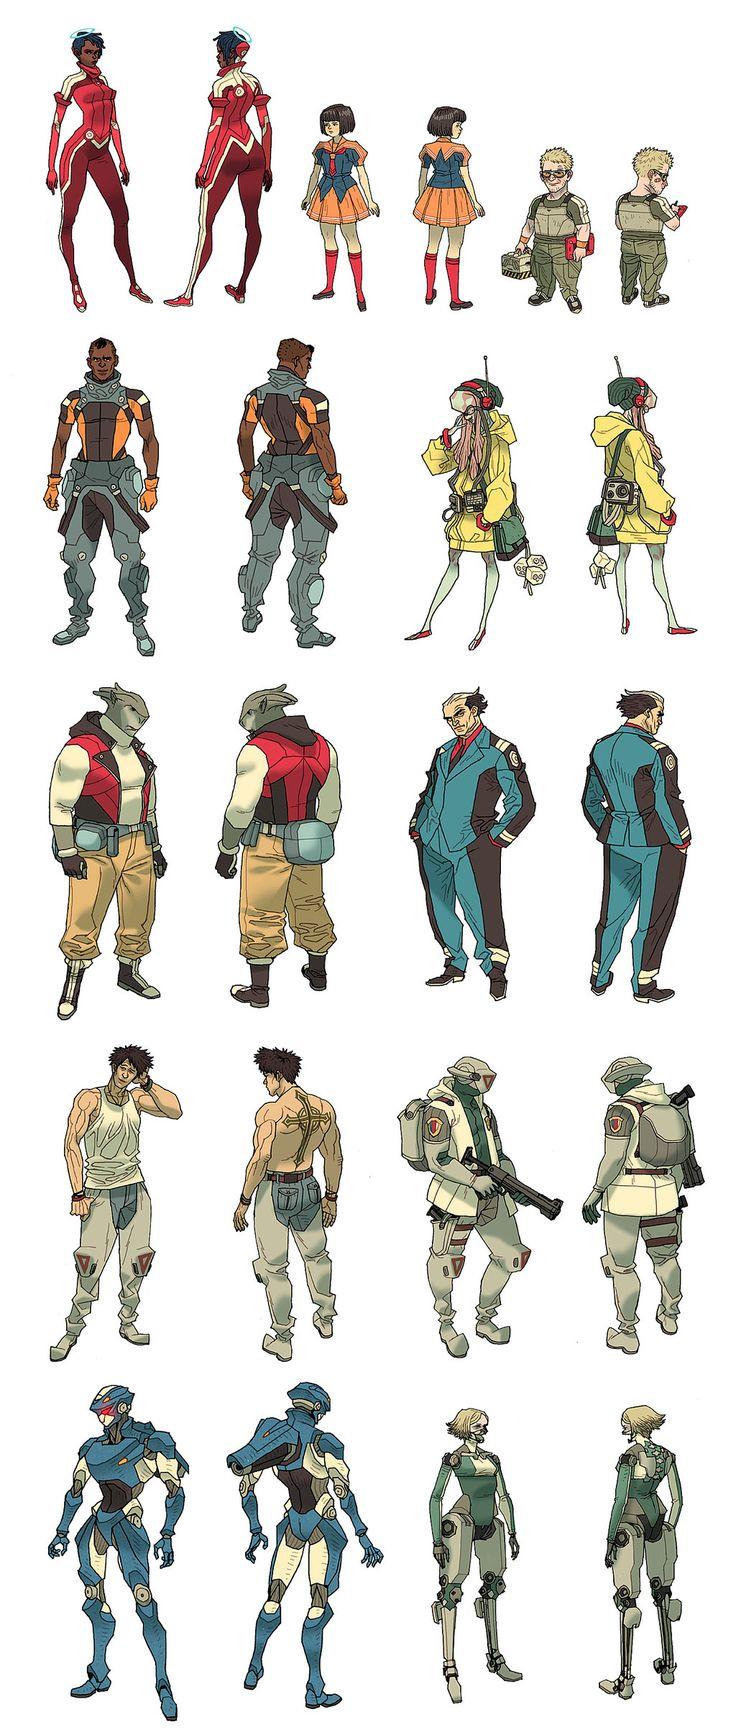 http://afuchan.deviantart.com/art/HaloGen-Character-Sheets-570784867